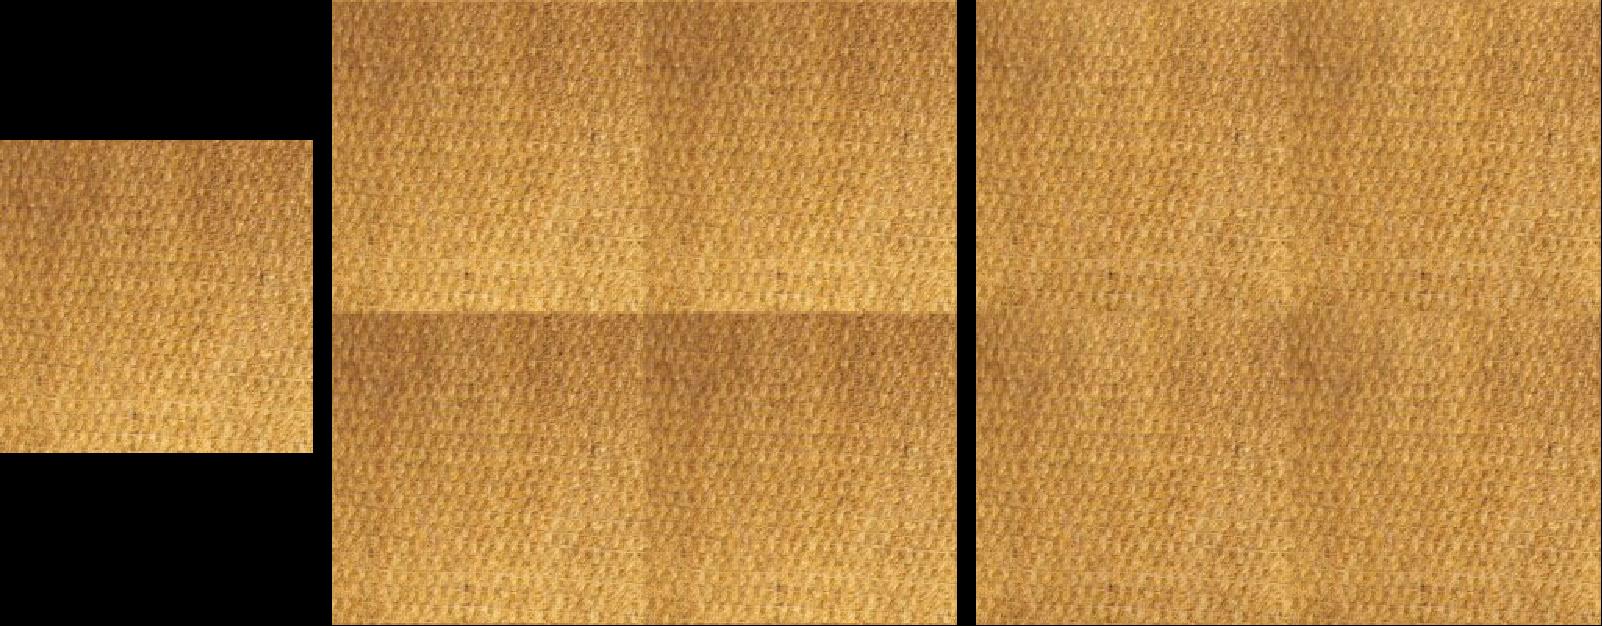 Seamless tiling